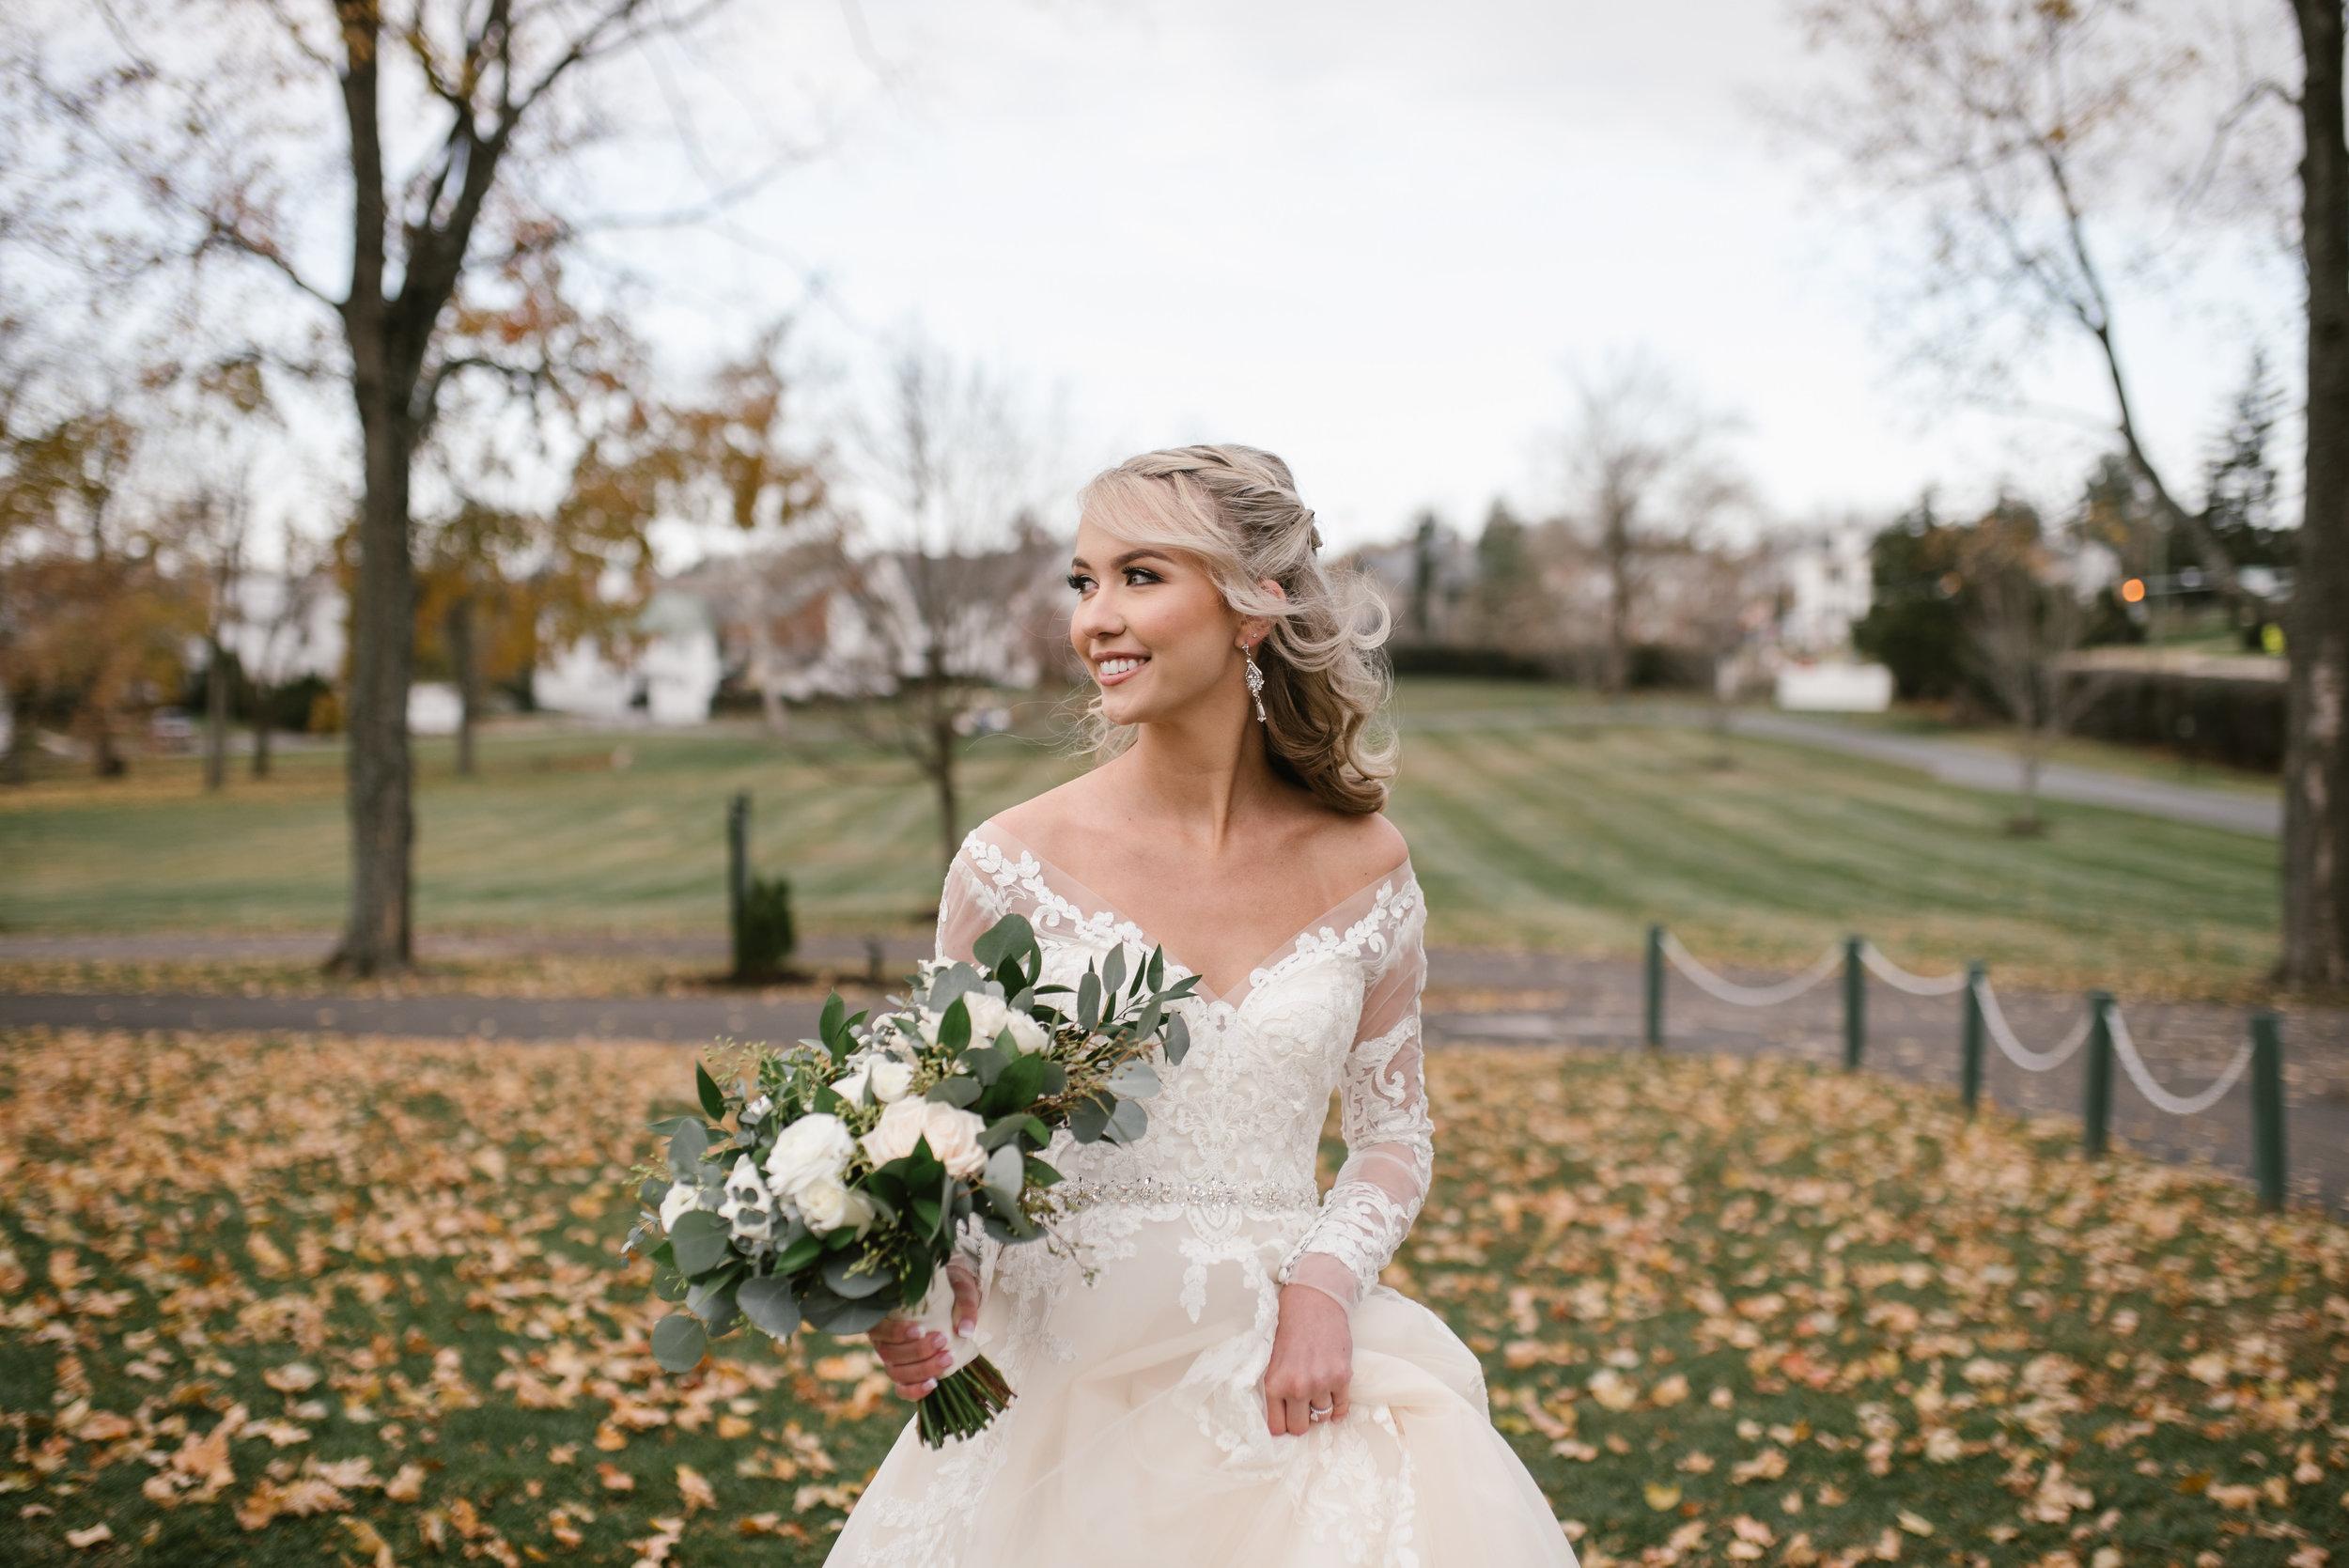 antrim-18444-spencer-wedding-973.jpg